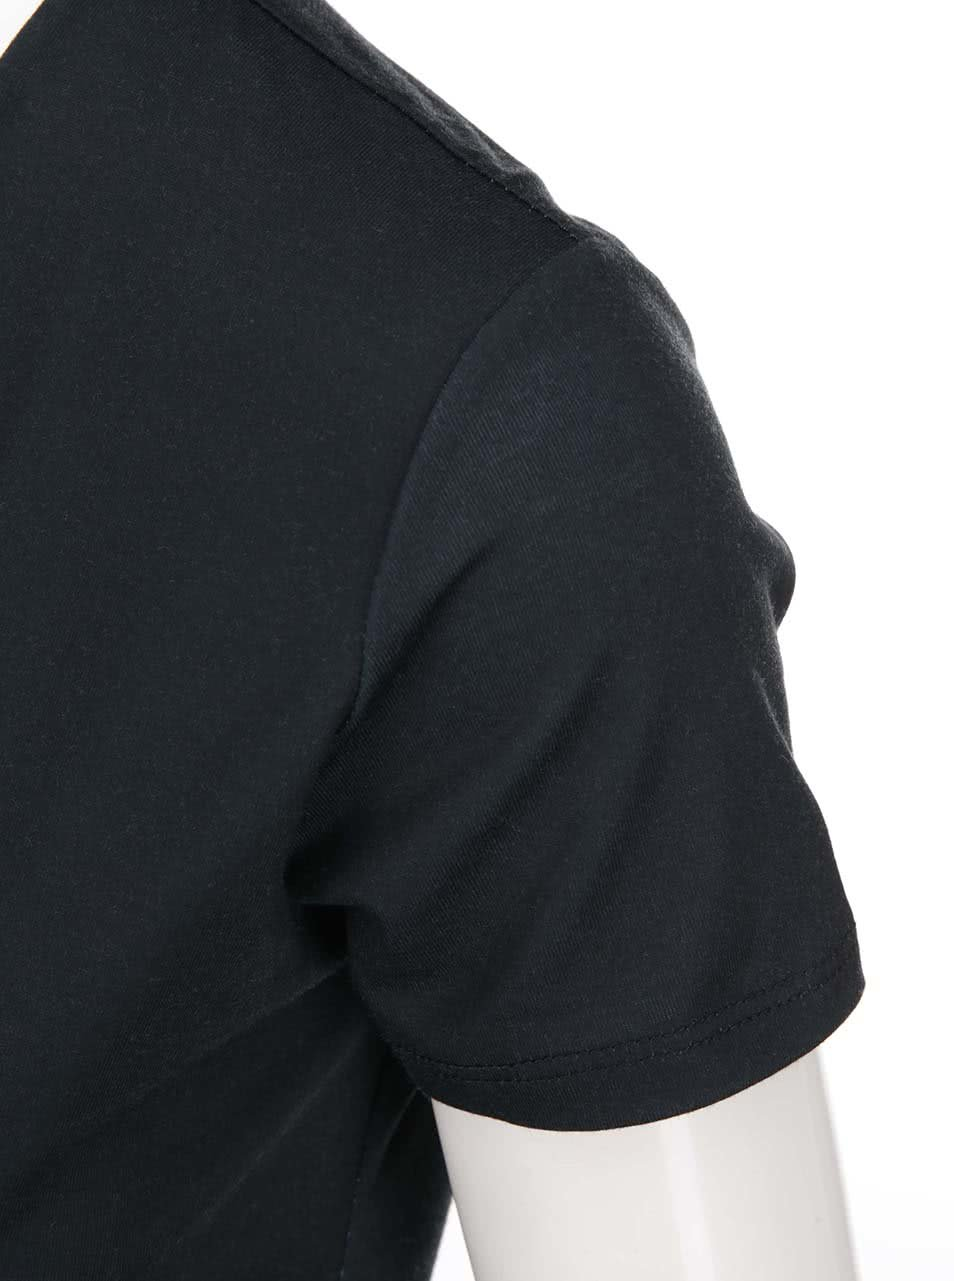 e2eed3ed7539 Bielo-modro-čierne šaty Desigual Karlie ...